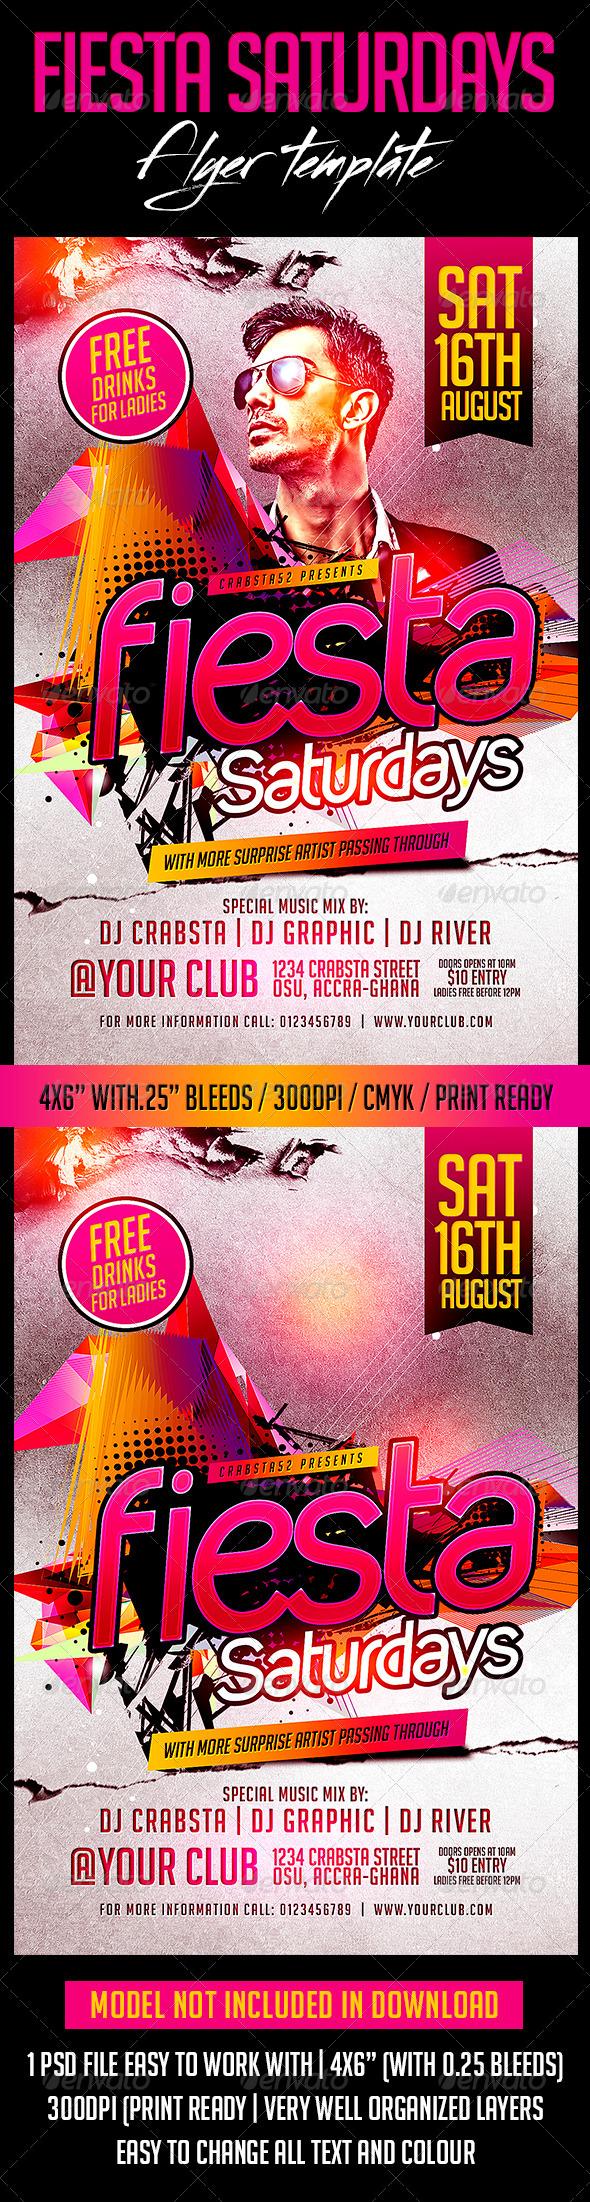 GraphicRiver Fiesta Saturdays Flyer Template 8061085